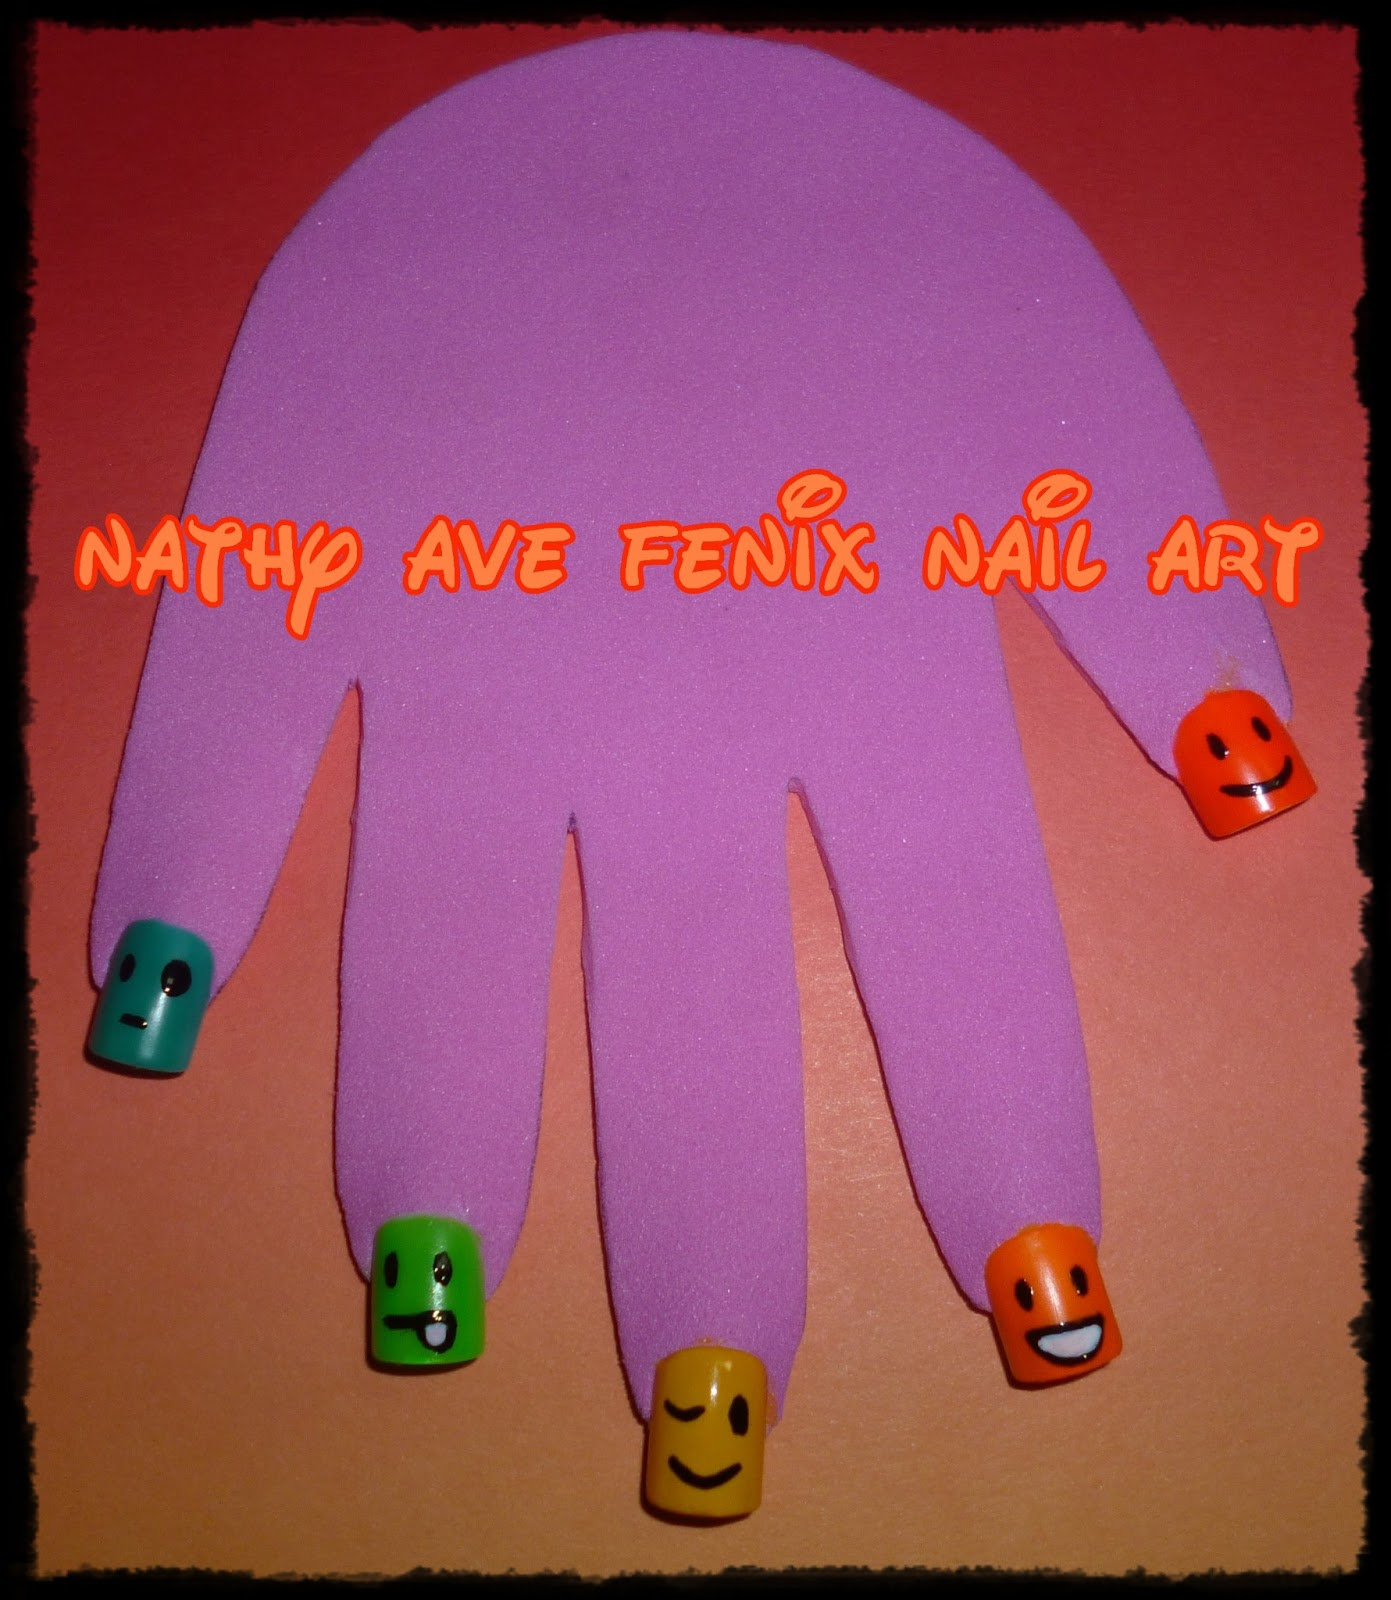 Nail Art Pik Avenue: NATHY AVE FENIX NAIL ART: INFANTILES: DIA 6 DEL RETO